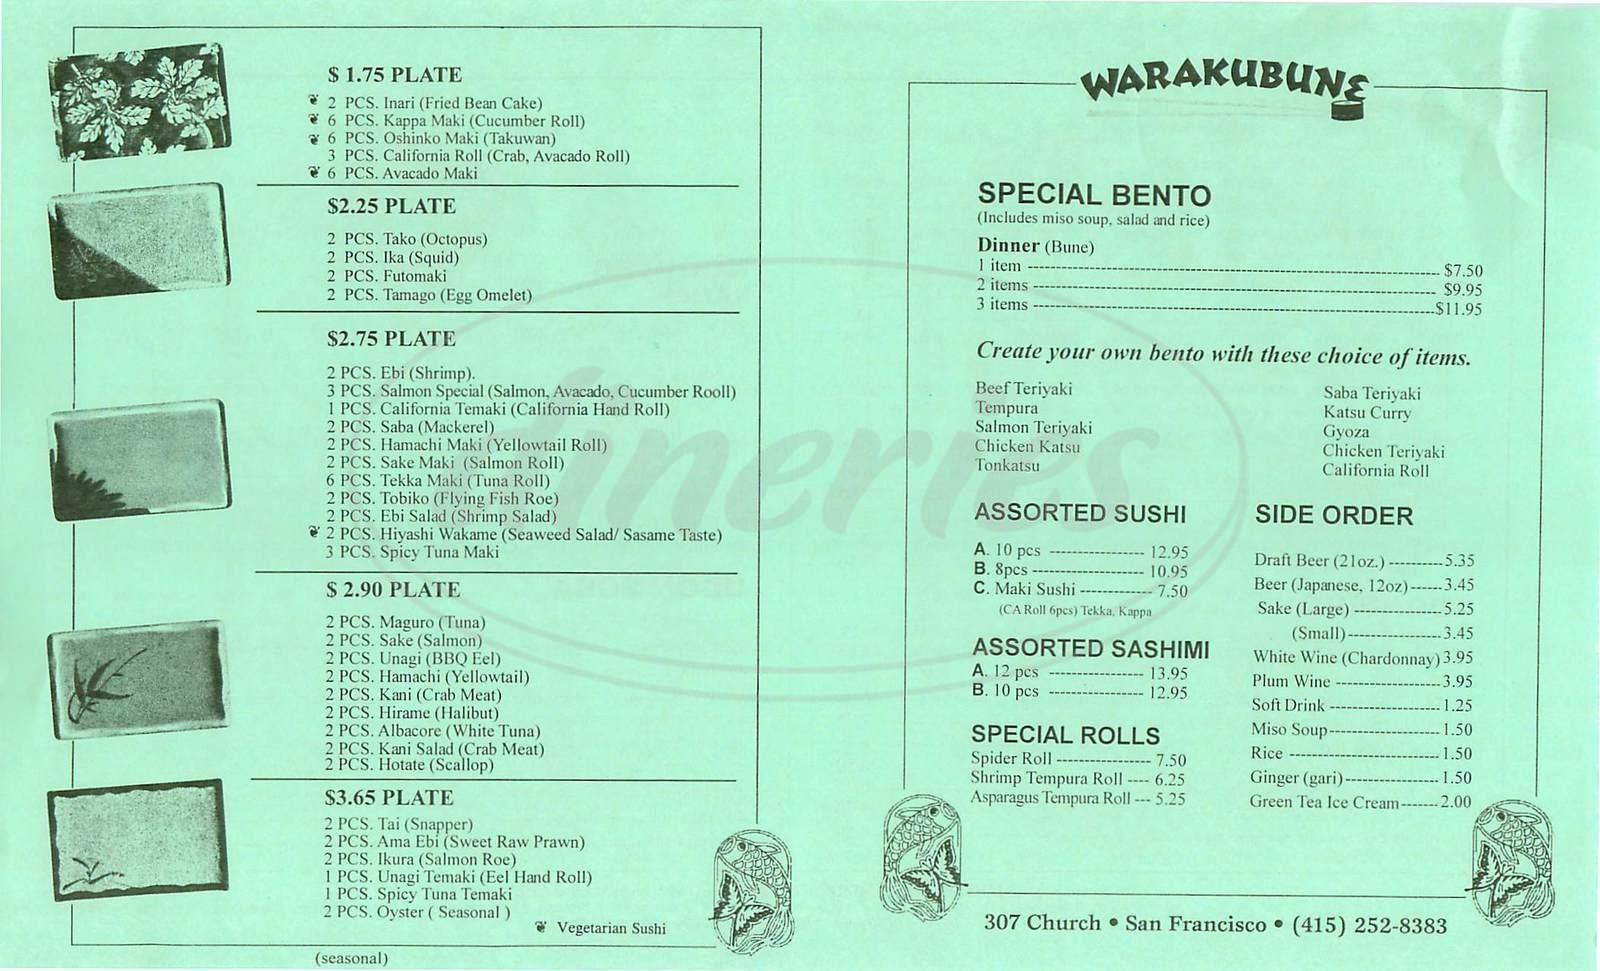 menu for Warakubune